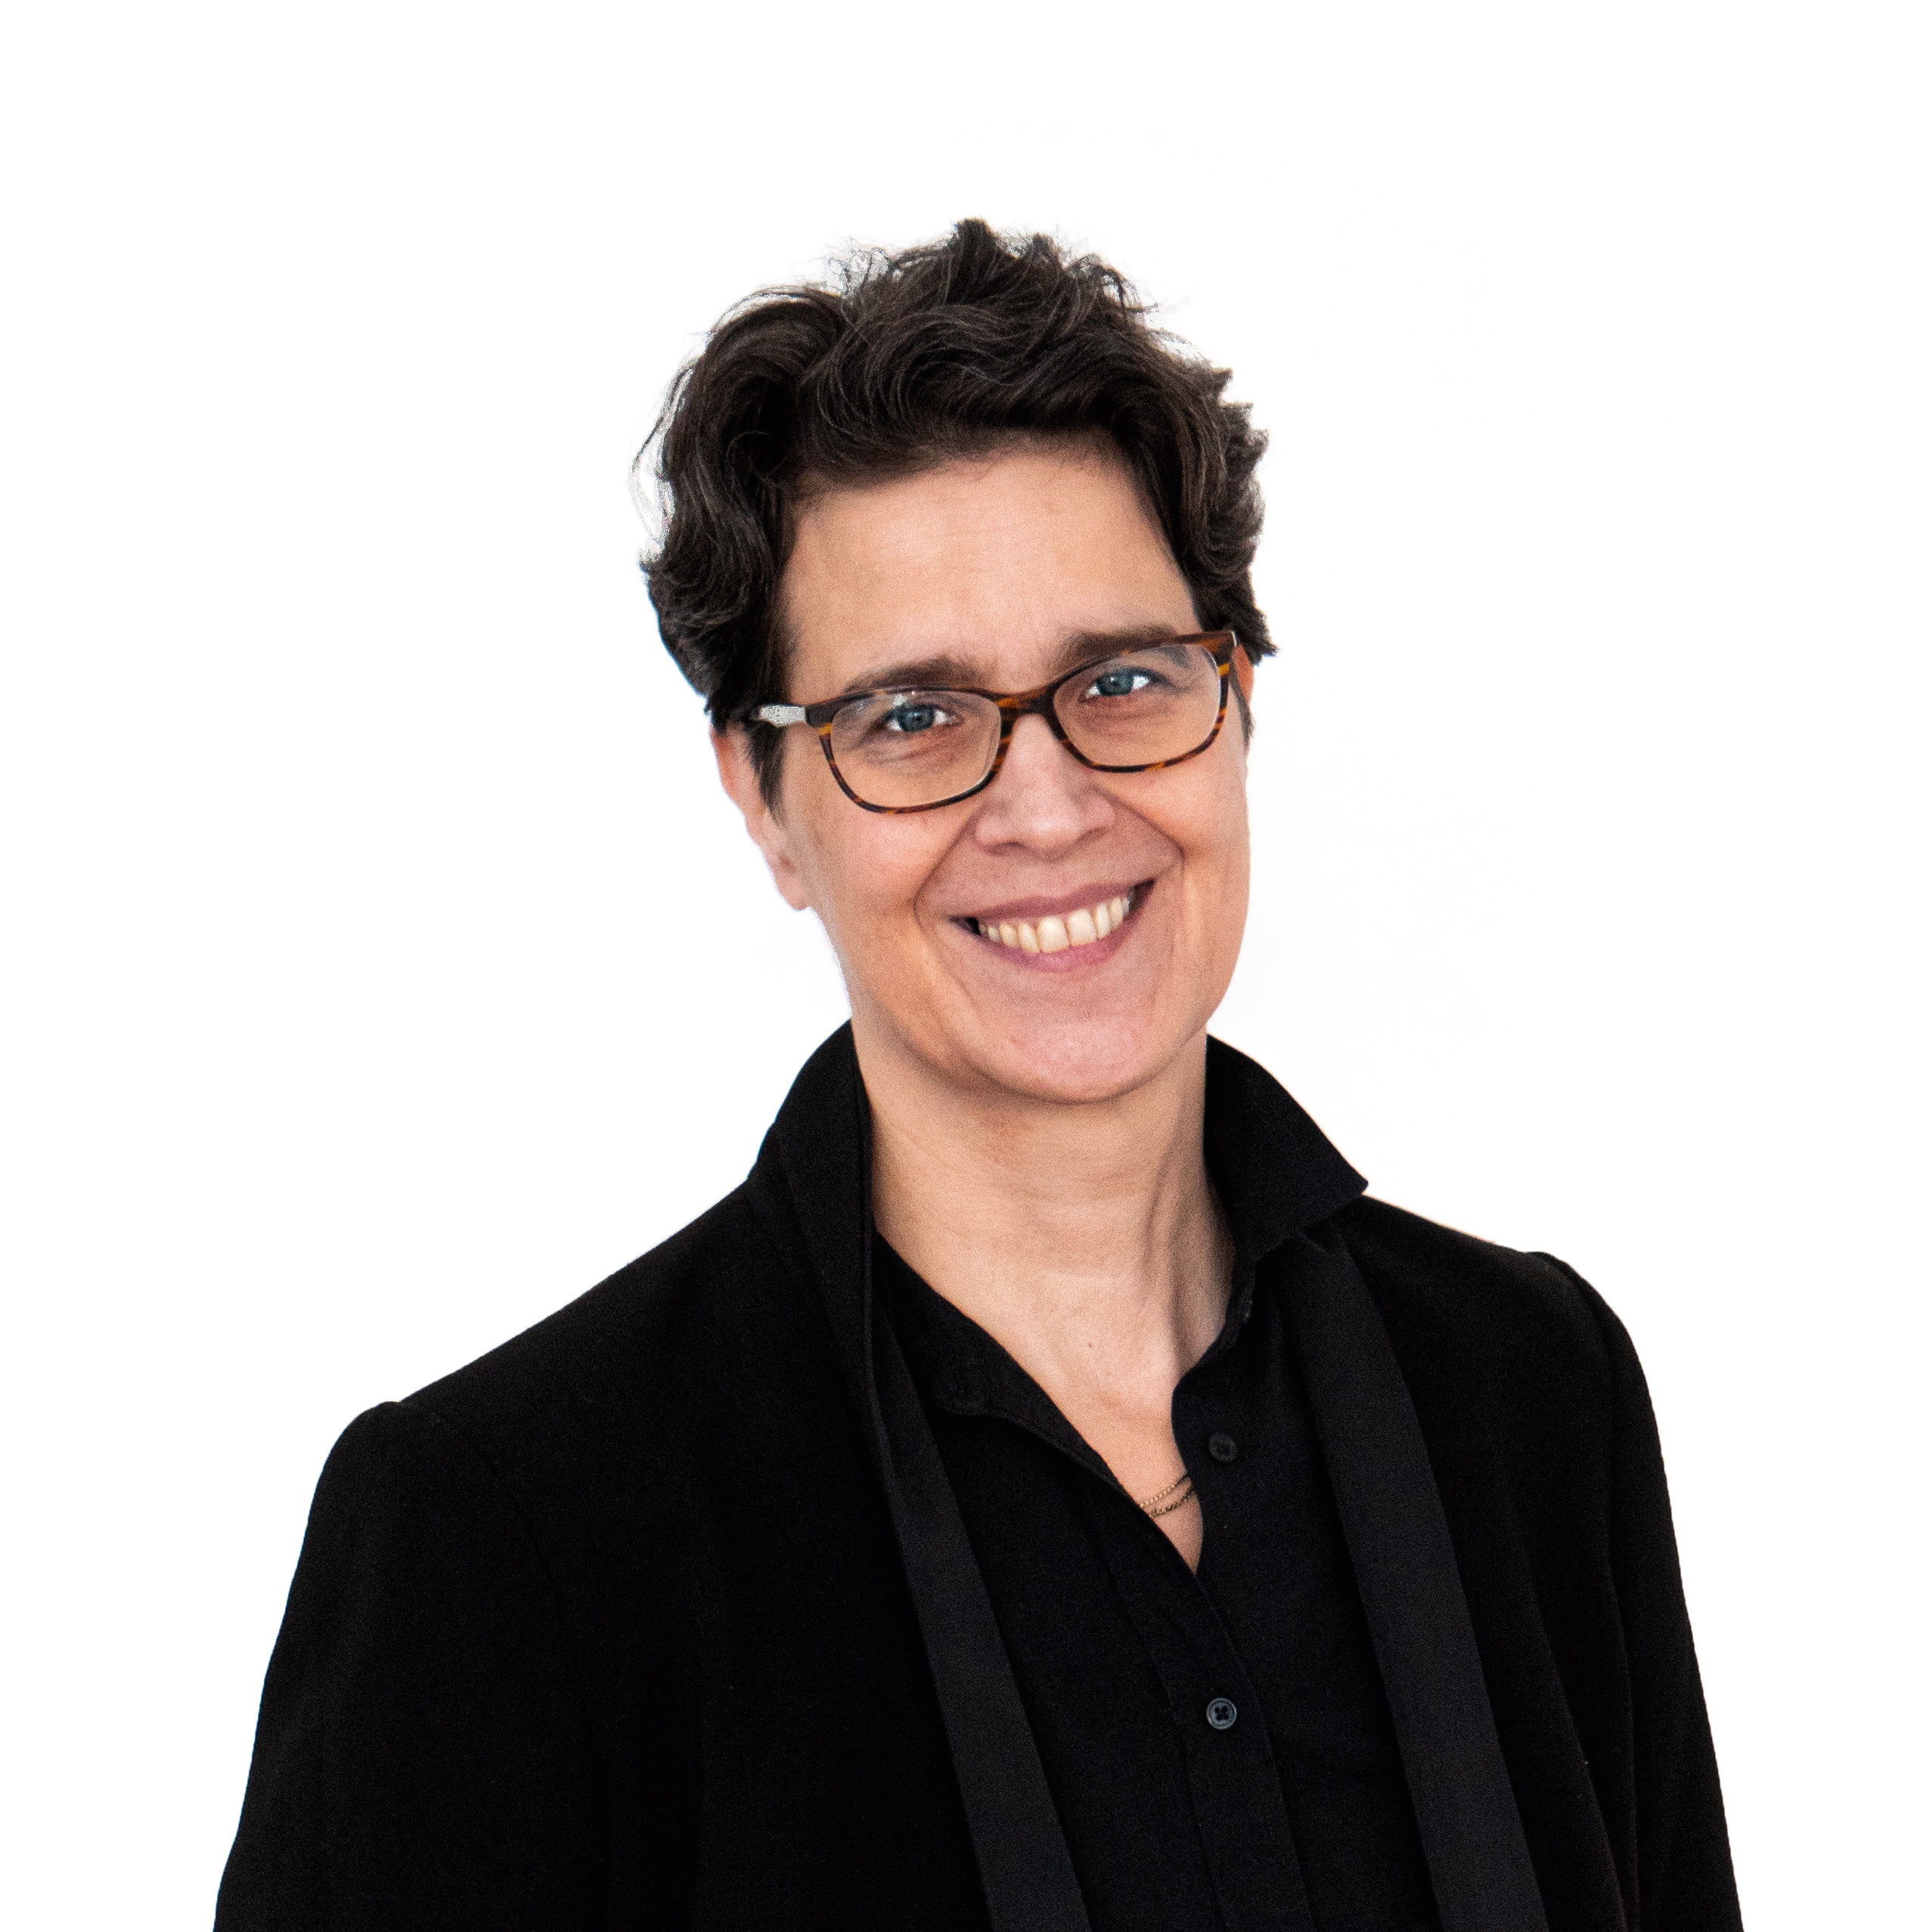 Ina Rosenthal